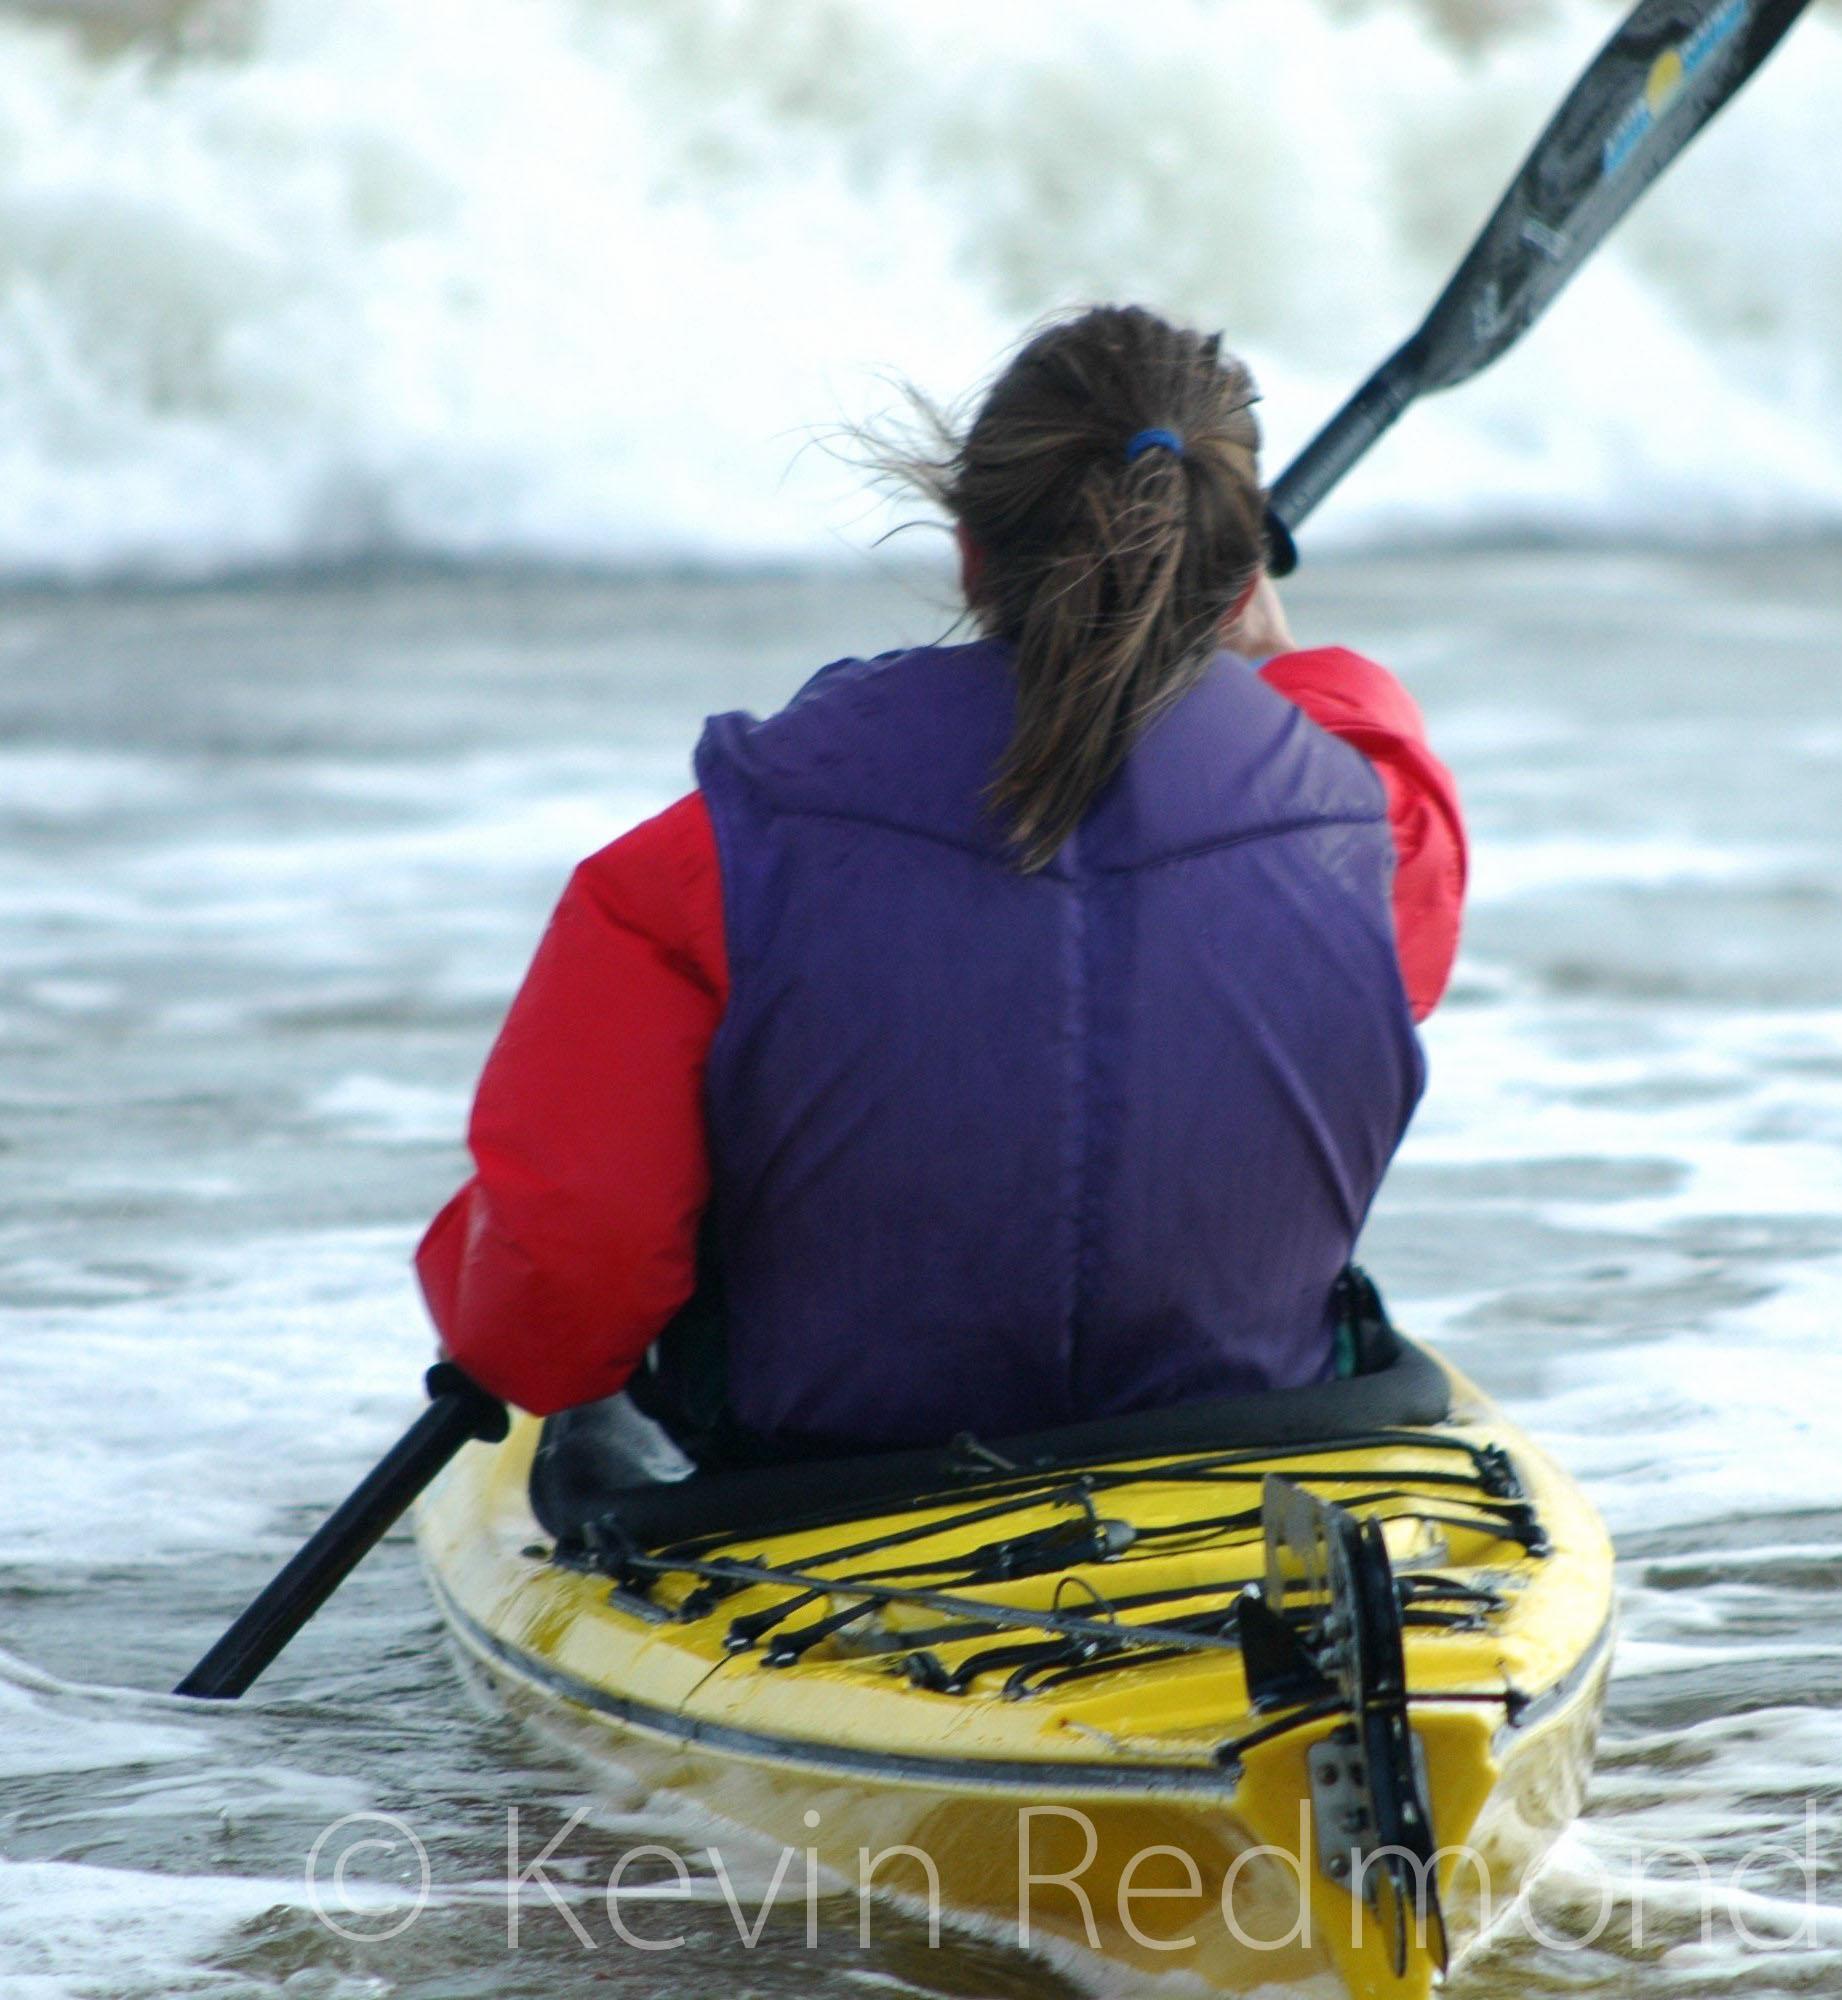 paddling-9.jpg